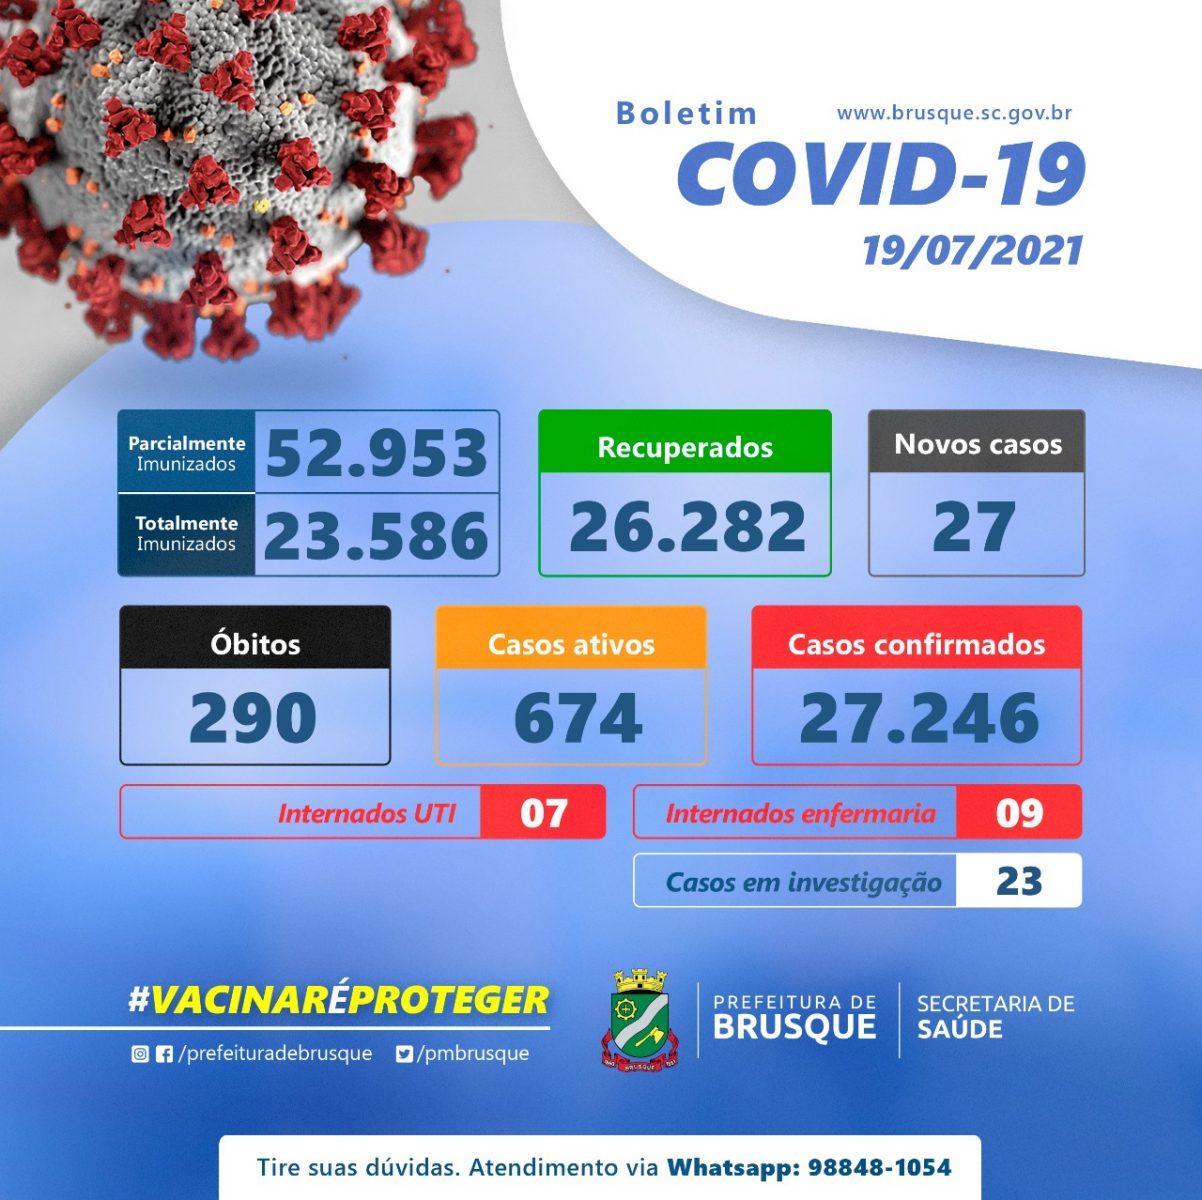 Covid-19: Confira o boletim epidemiológico desta segunda-feira (19)